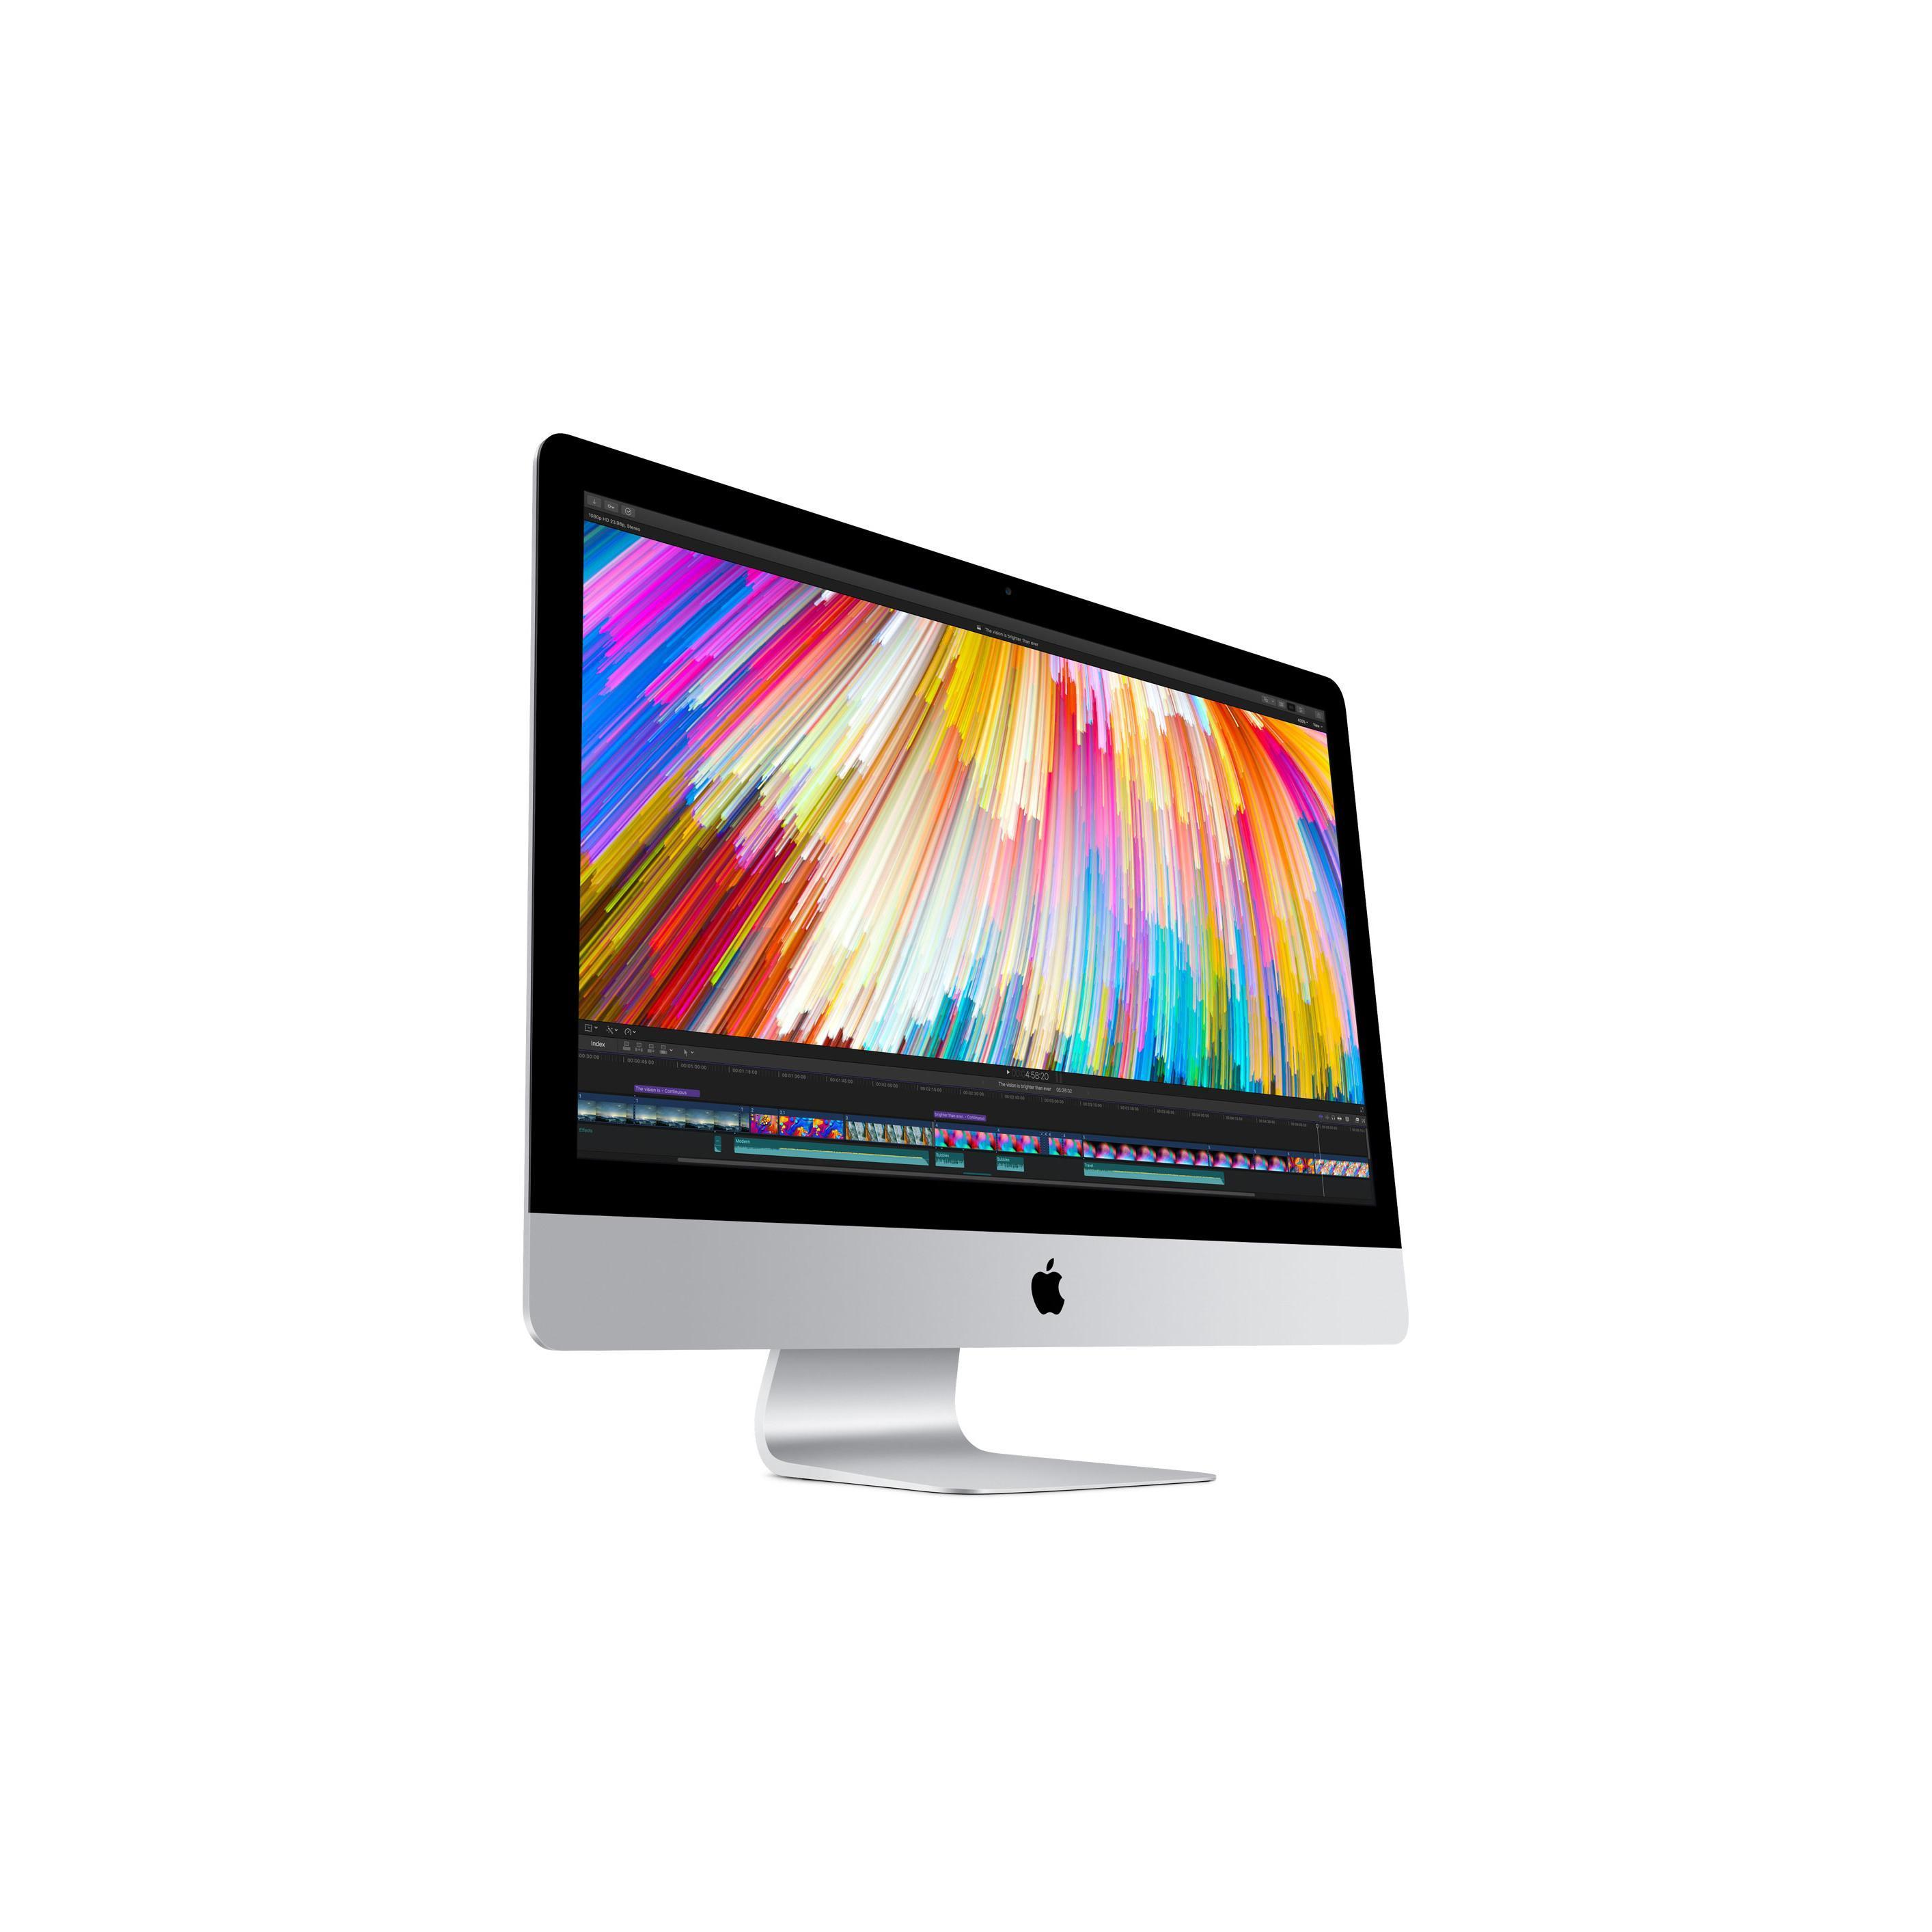 "iMac 27"" 5K (Ende 2015) Core i7 4 GHz  - SSD 128 GB + HDD 3 TB - 16GB AZERTY - Französisch"